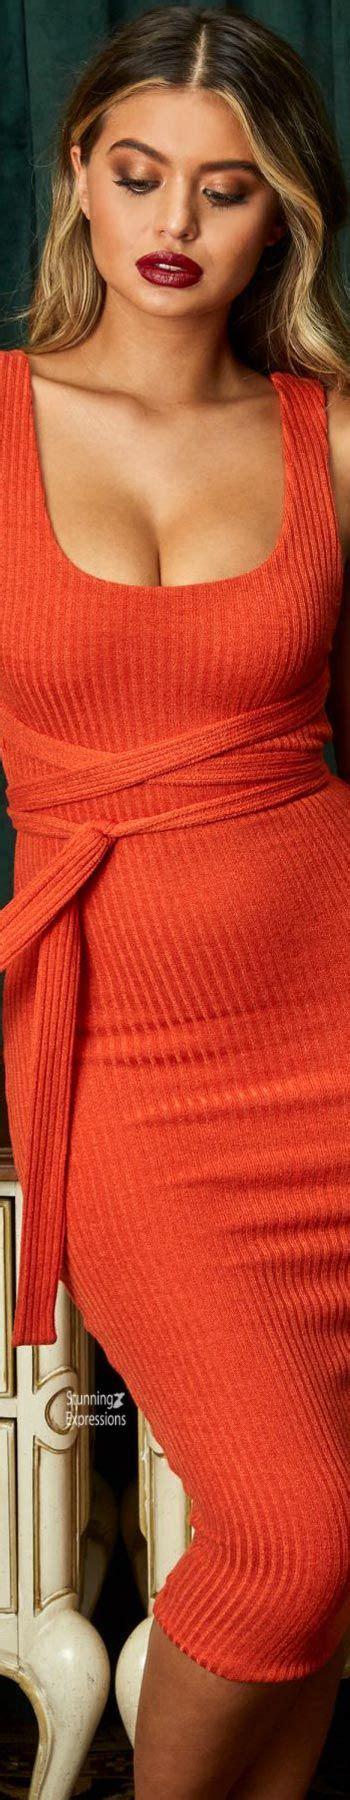 pin  stunning expressions  sofia jamora celebrities   dress   orange color